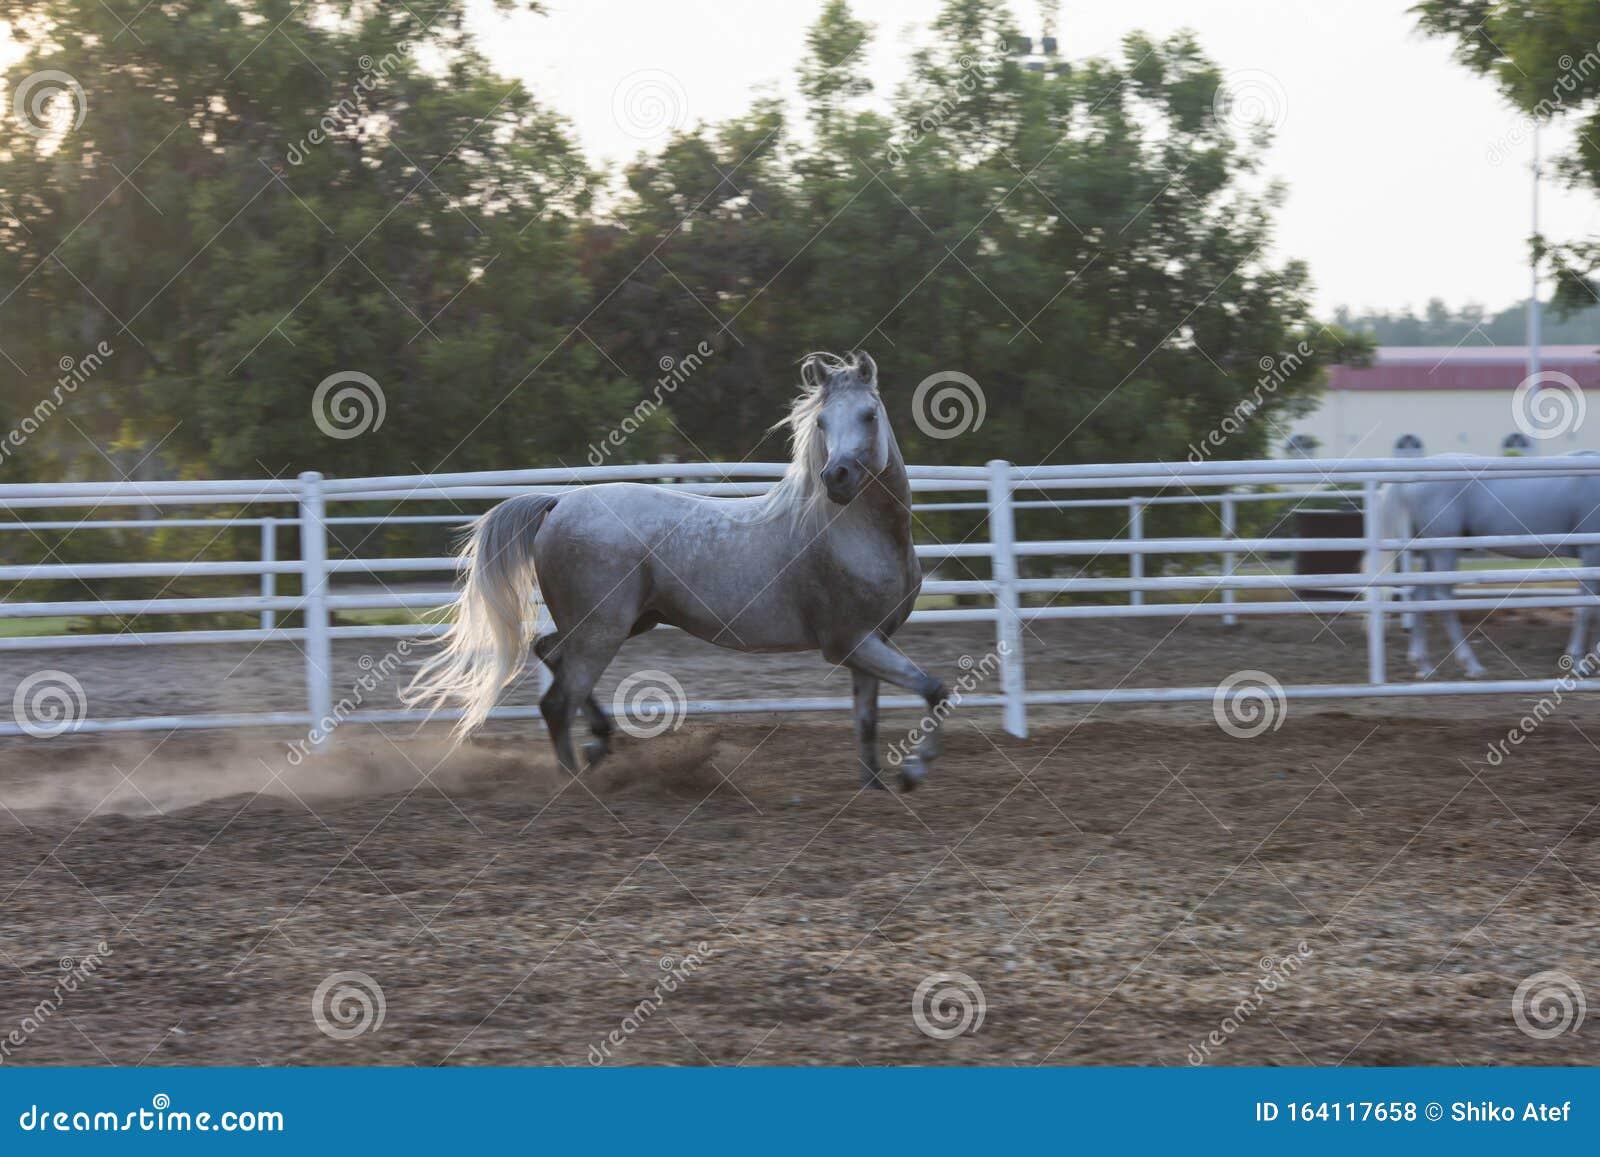 Lovely Arabian White Horse Dubai Stock Photo Image Of Beautiful Lovely 164117658